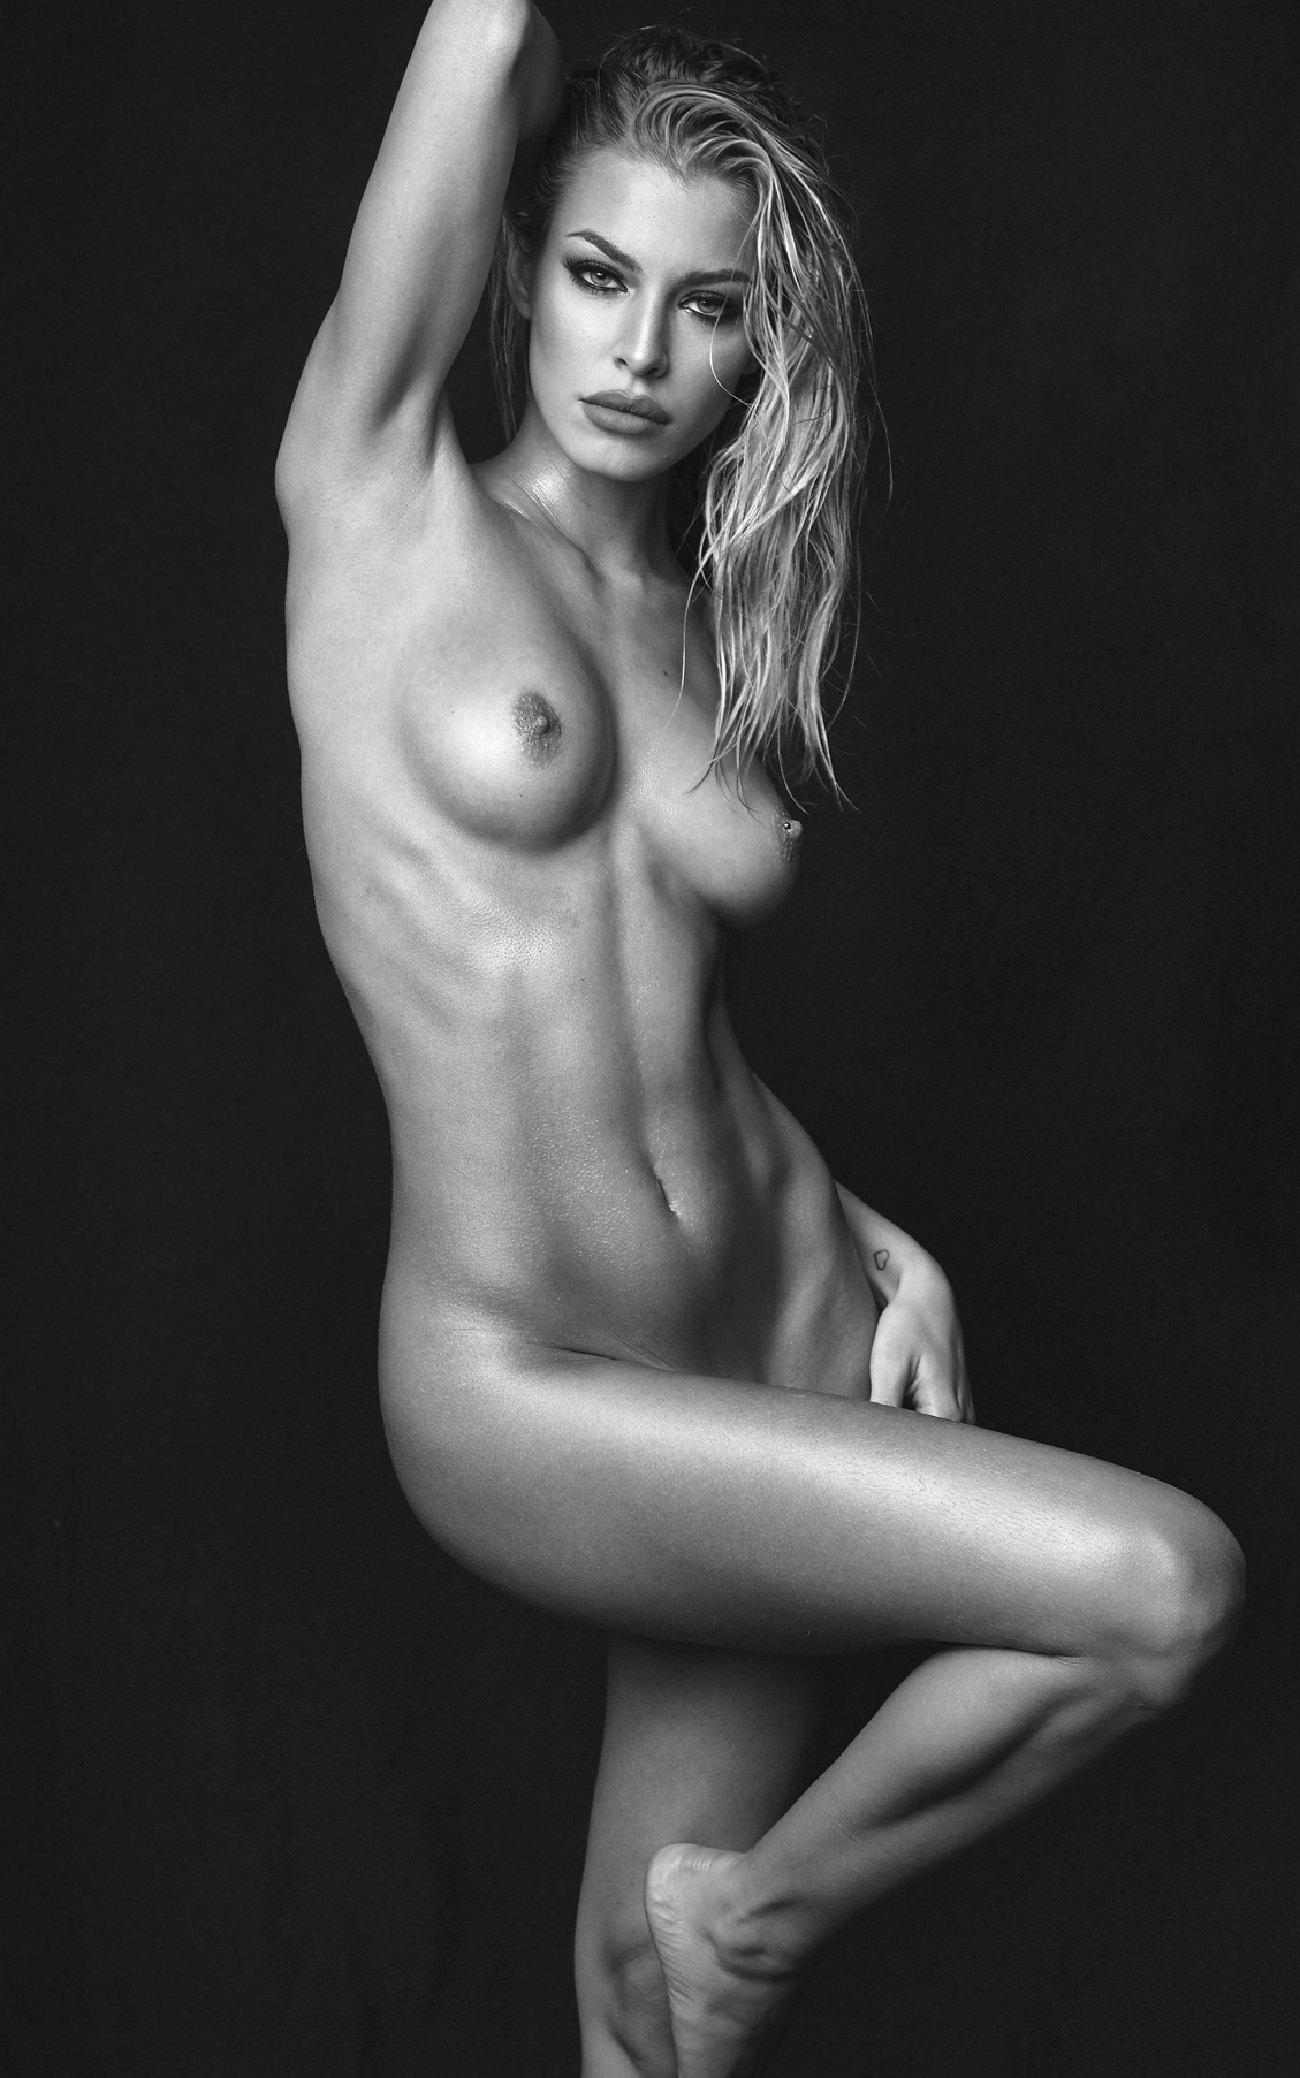 Jessica Goicoechea by Carlos Villarejo